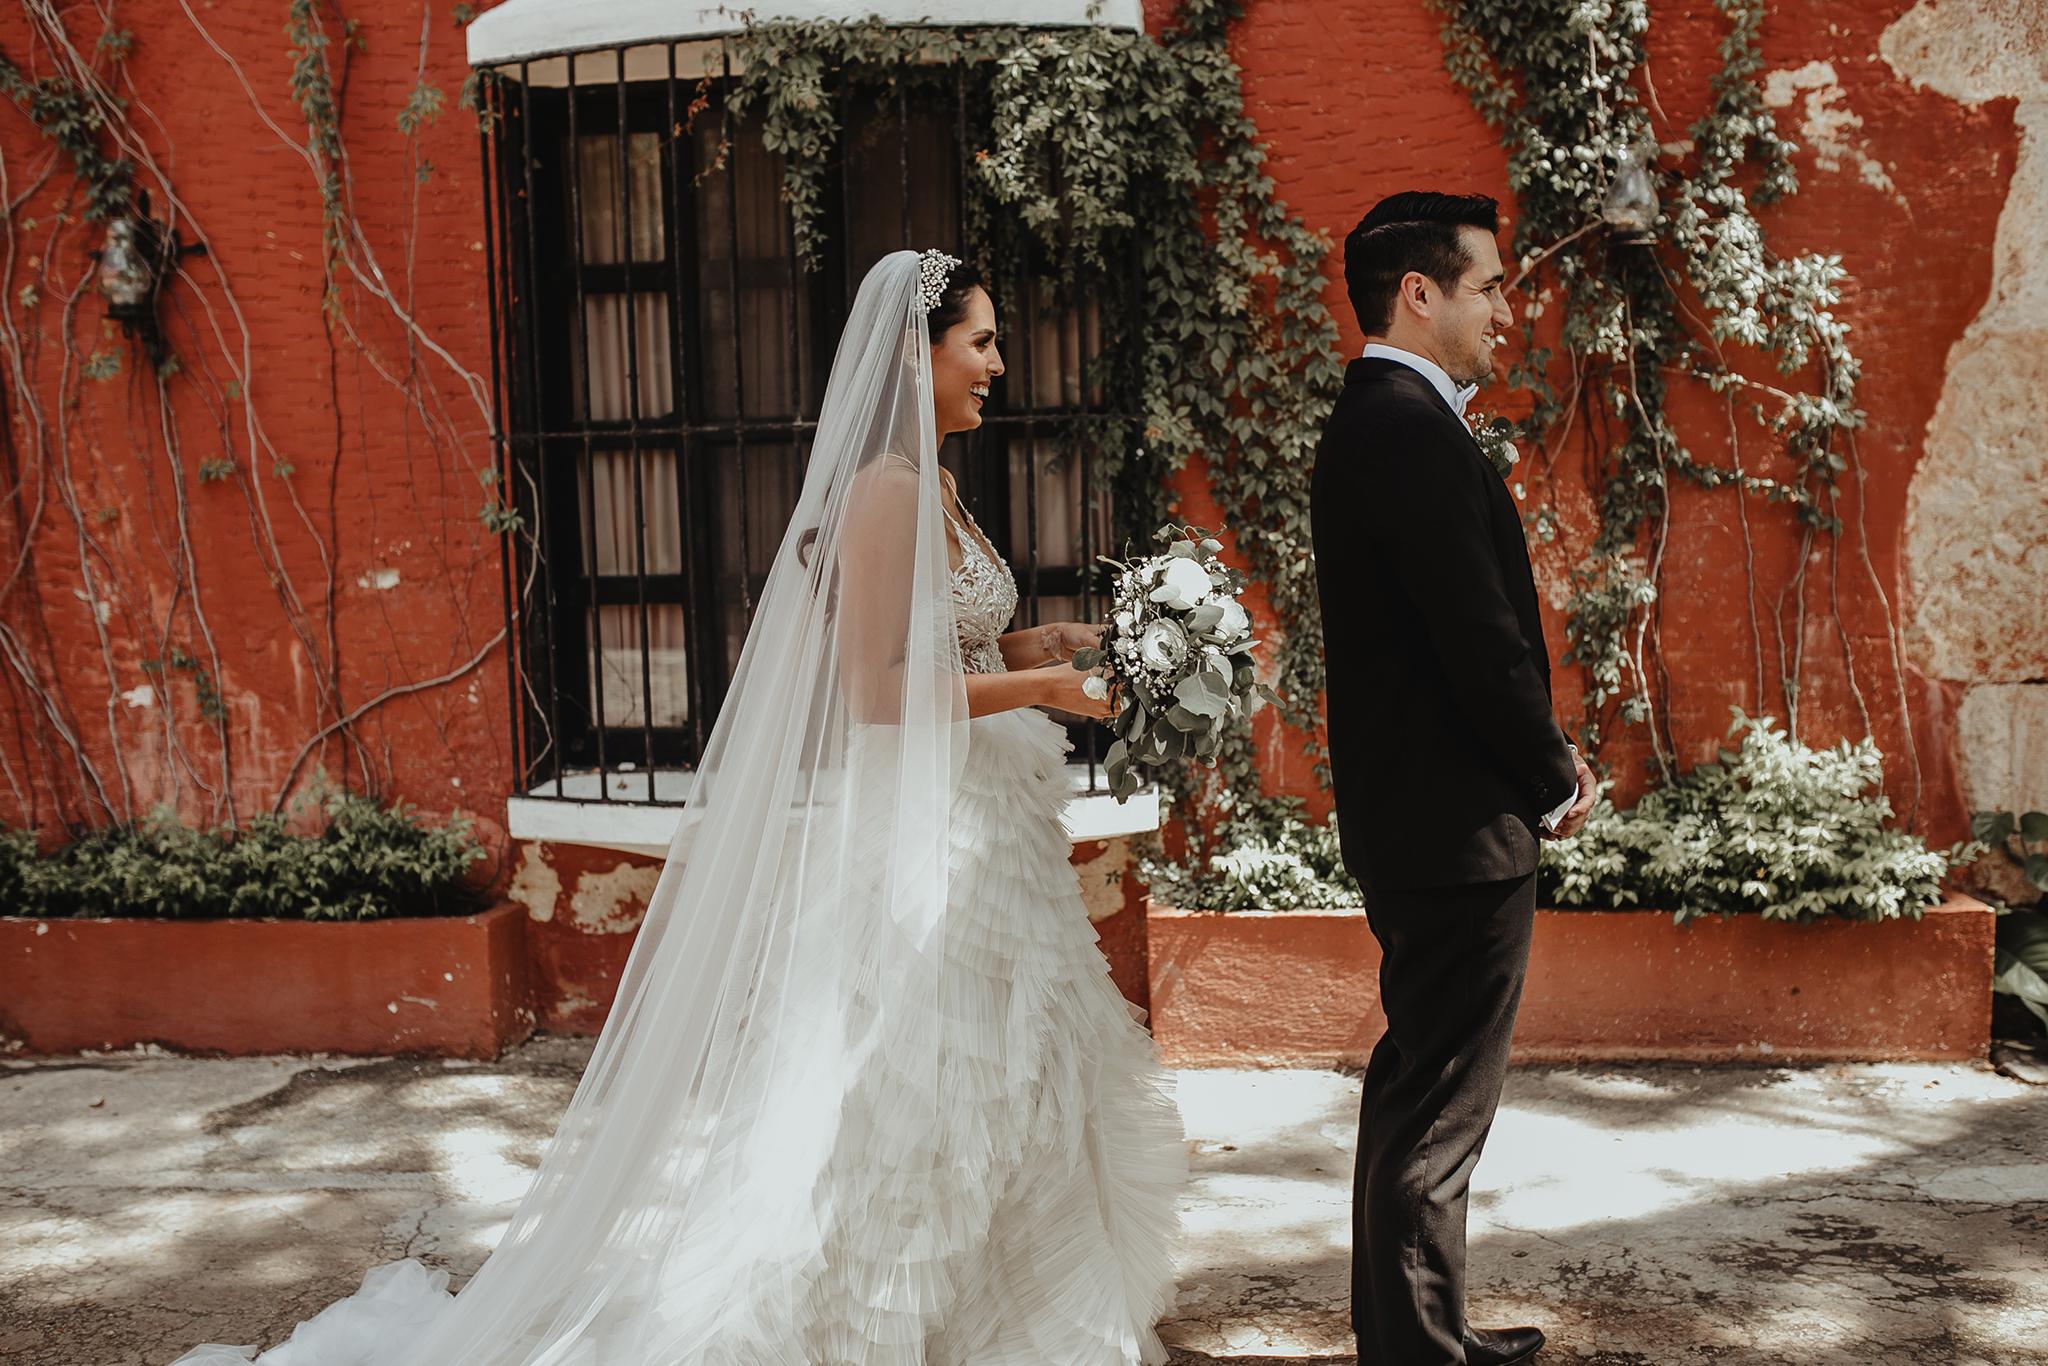 0288R&F__WeddingDestination_Weddingmerida_BodaMexico_FotografoDeBodas_FabrizioSimoneenFotografo.jpg